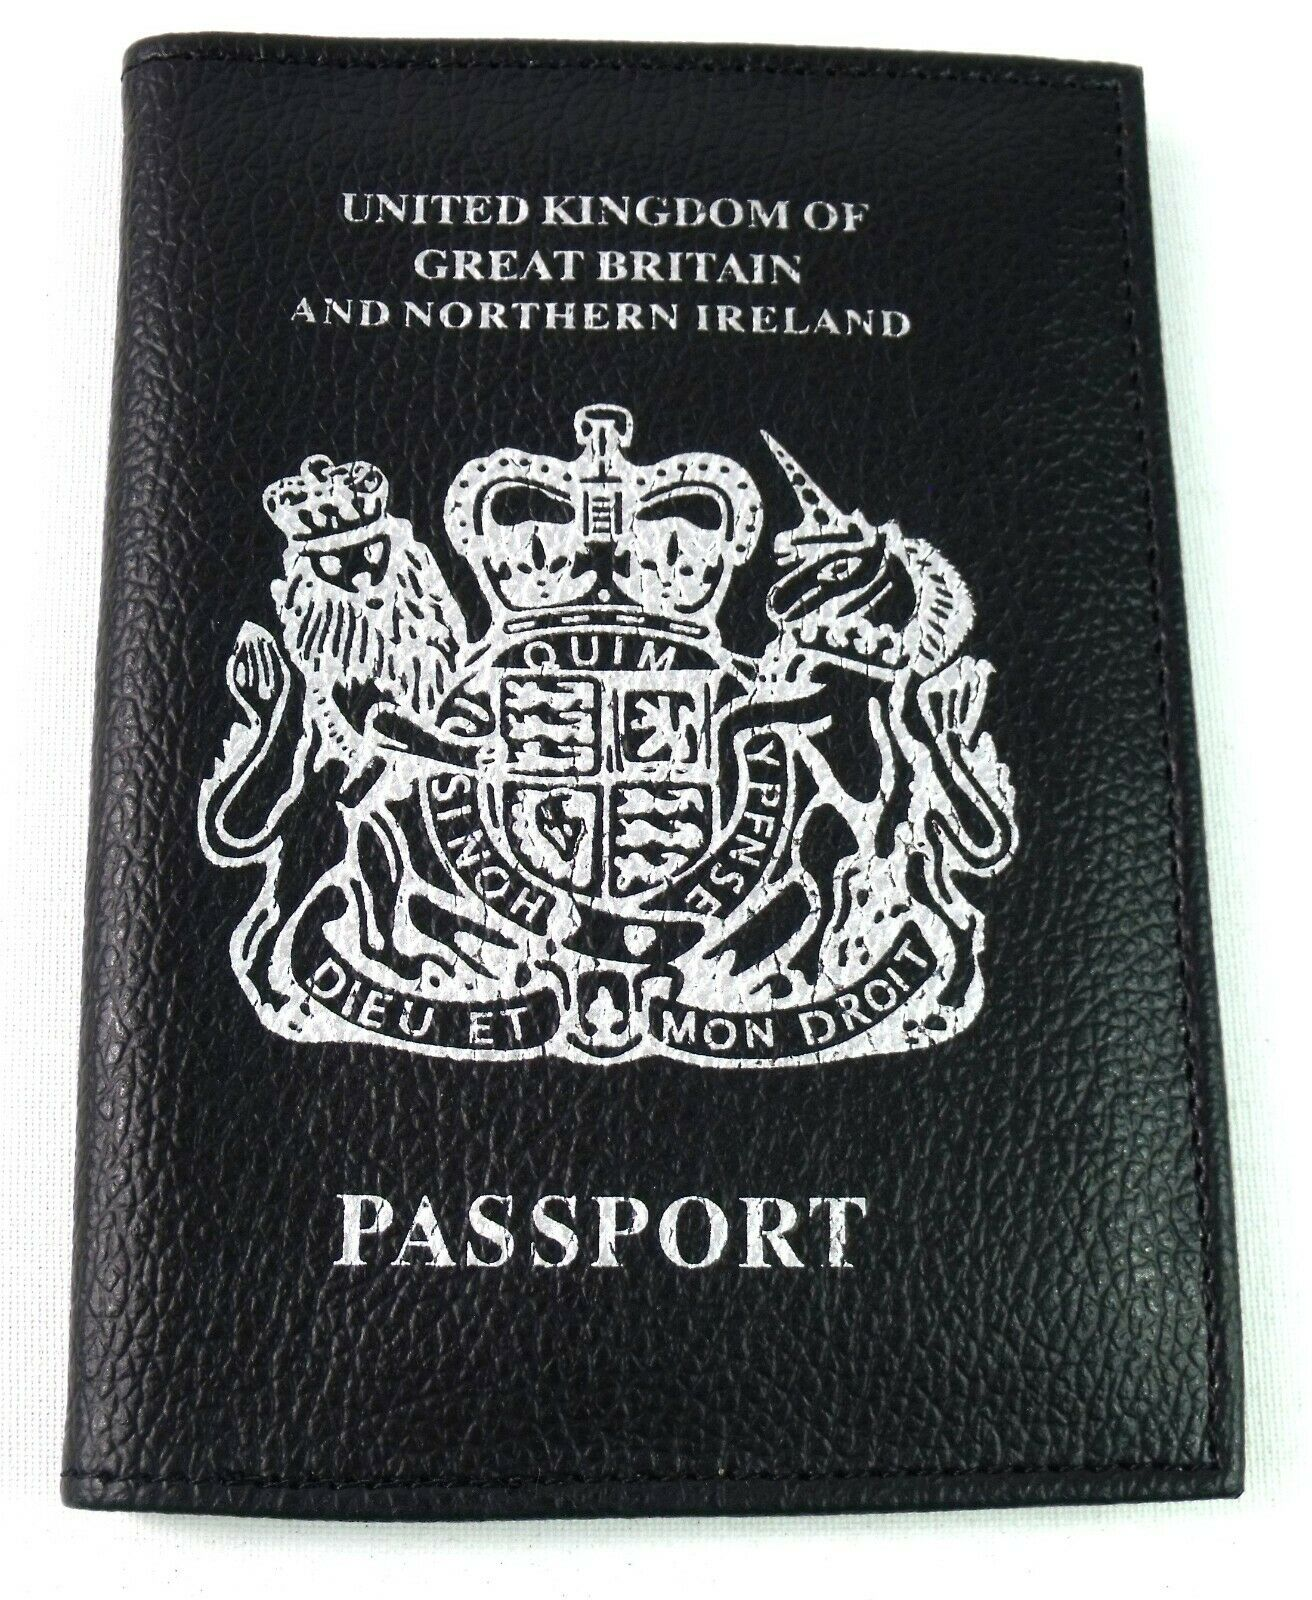 Neuf UK Européen Passport Support Housse Protection Portefeuille Voyage Document